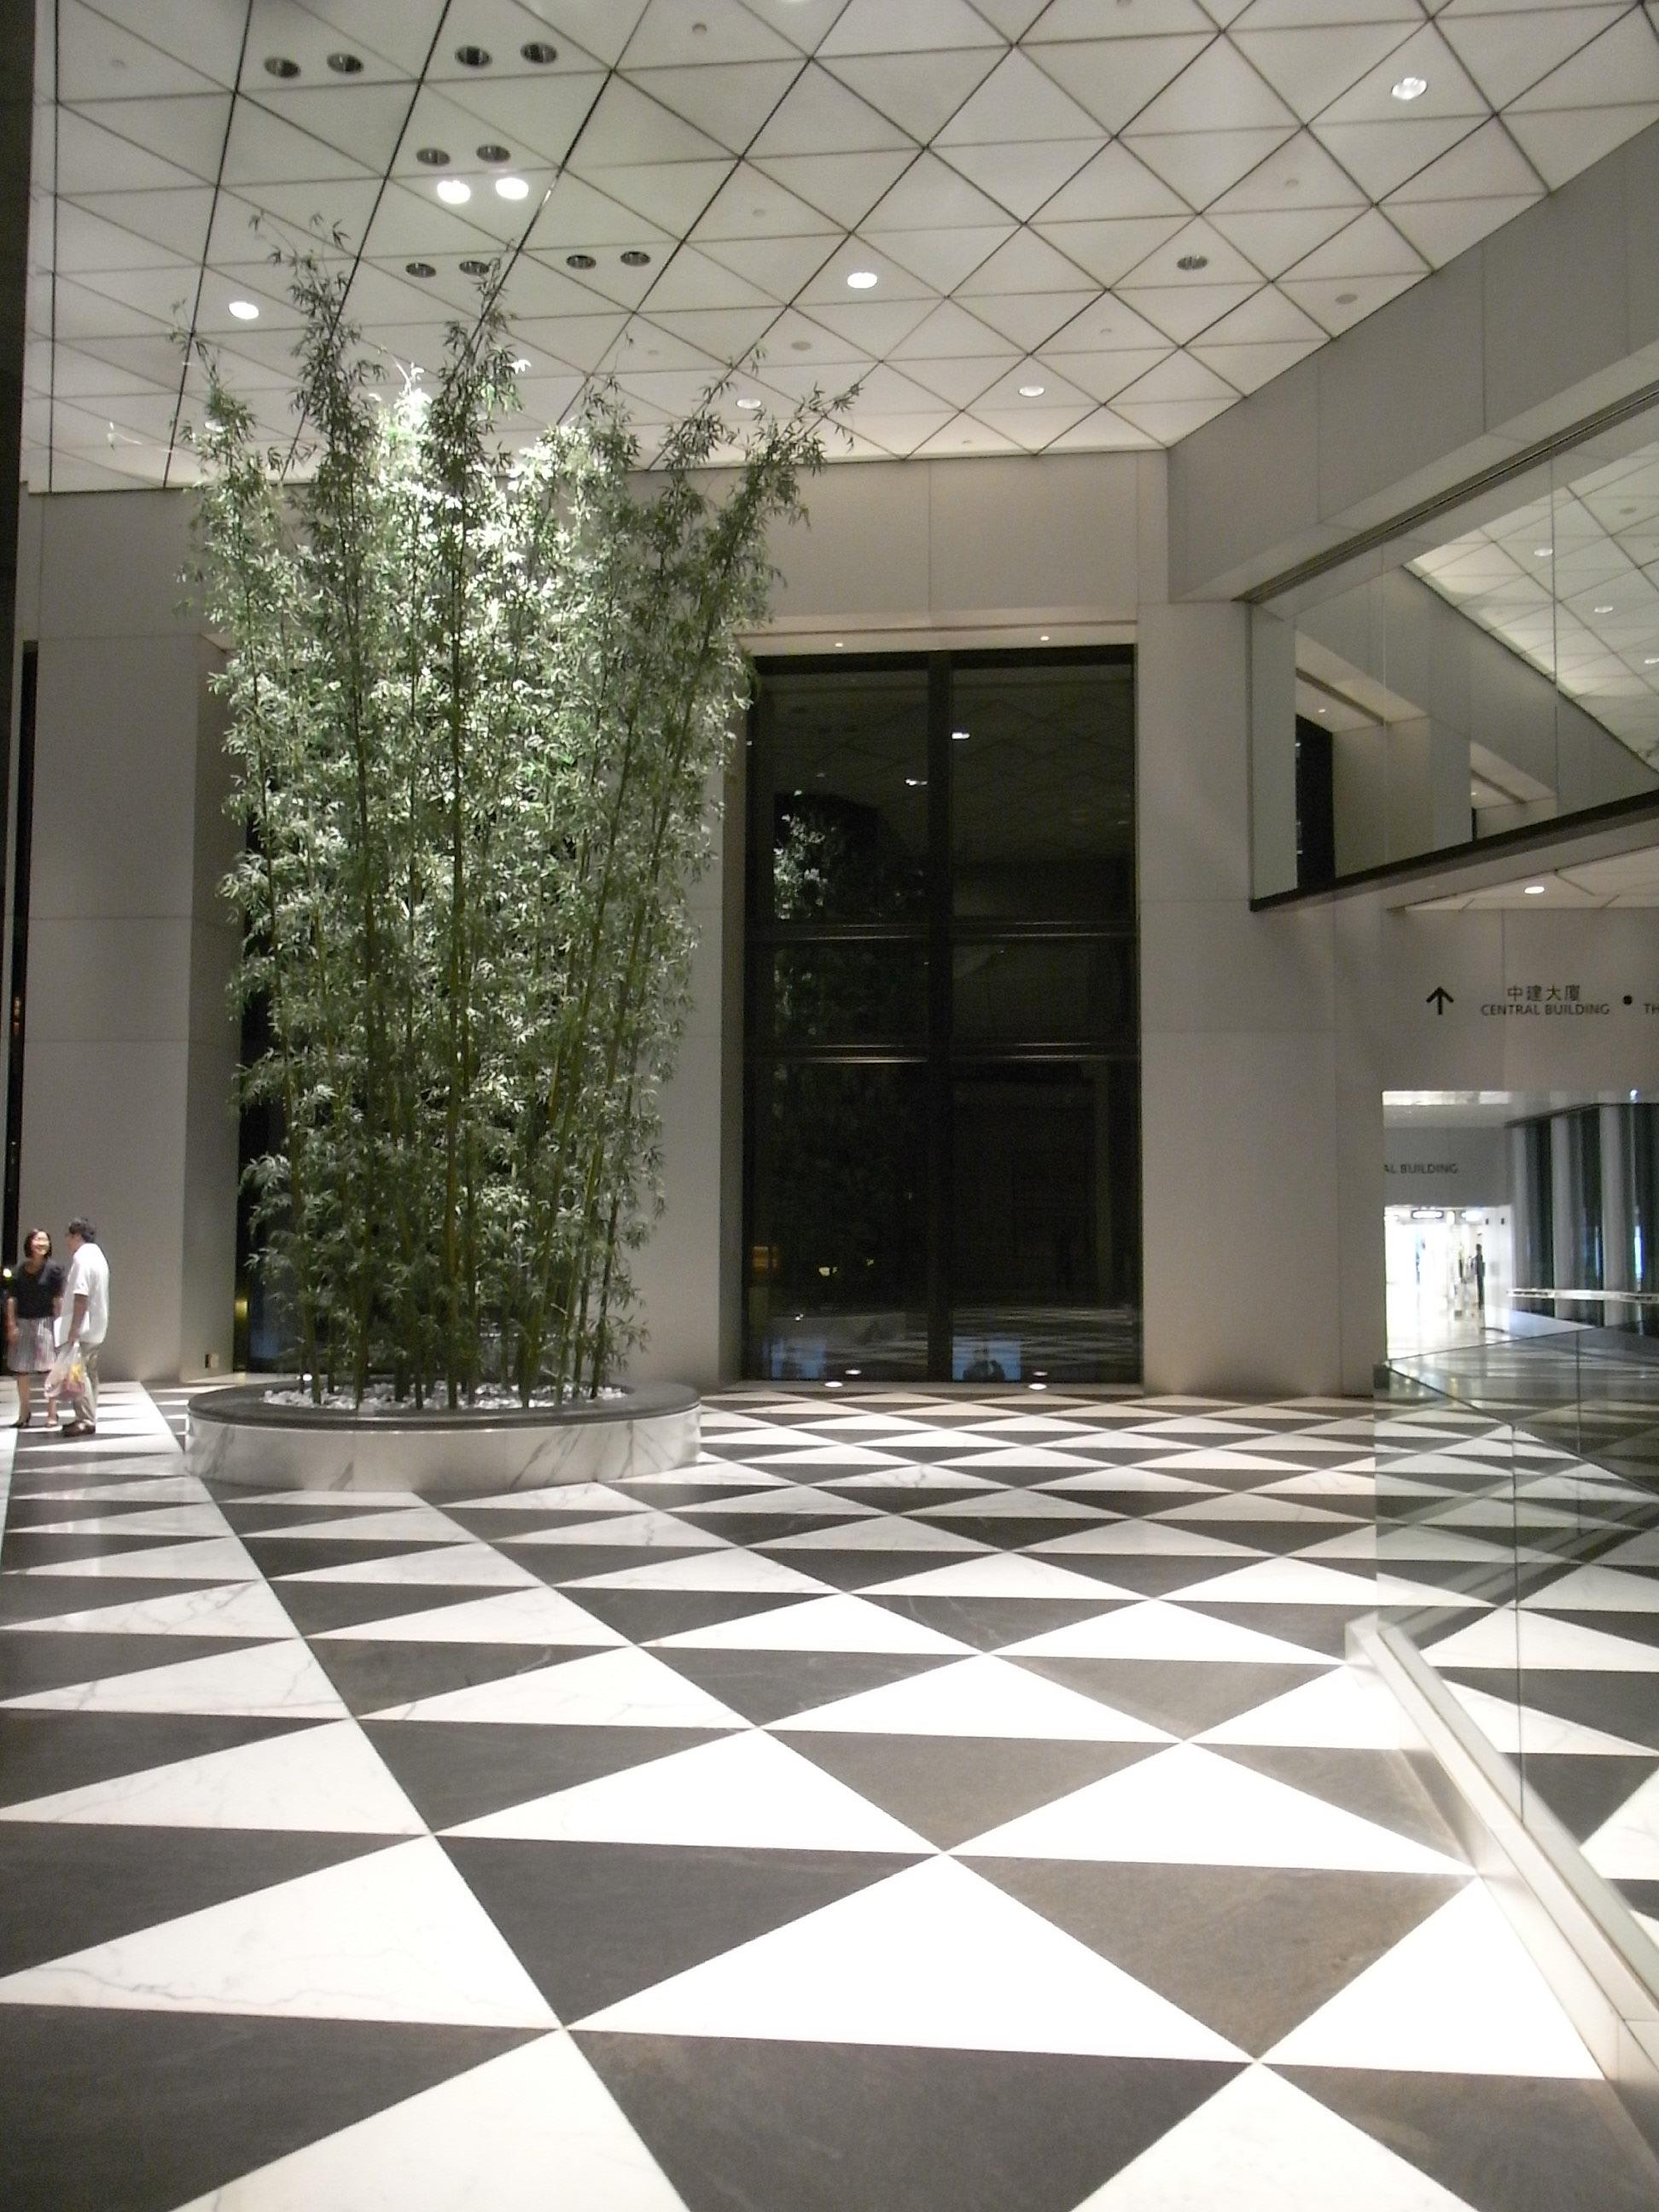 Patterned floor tiles kitchen - Patterned Floor Tiles Kitchen Photos